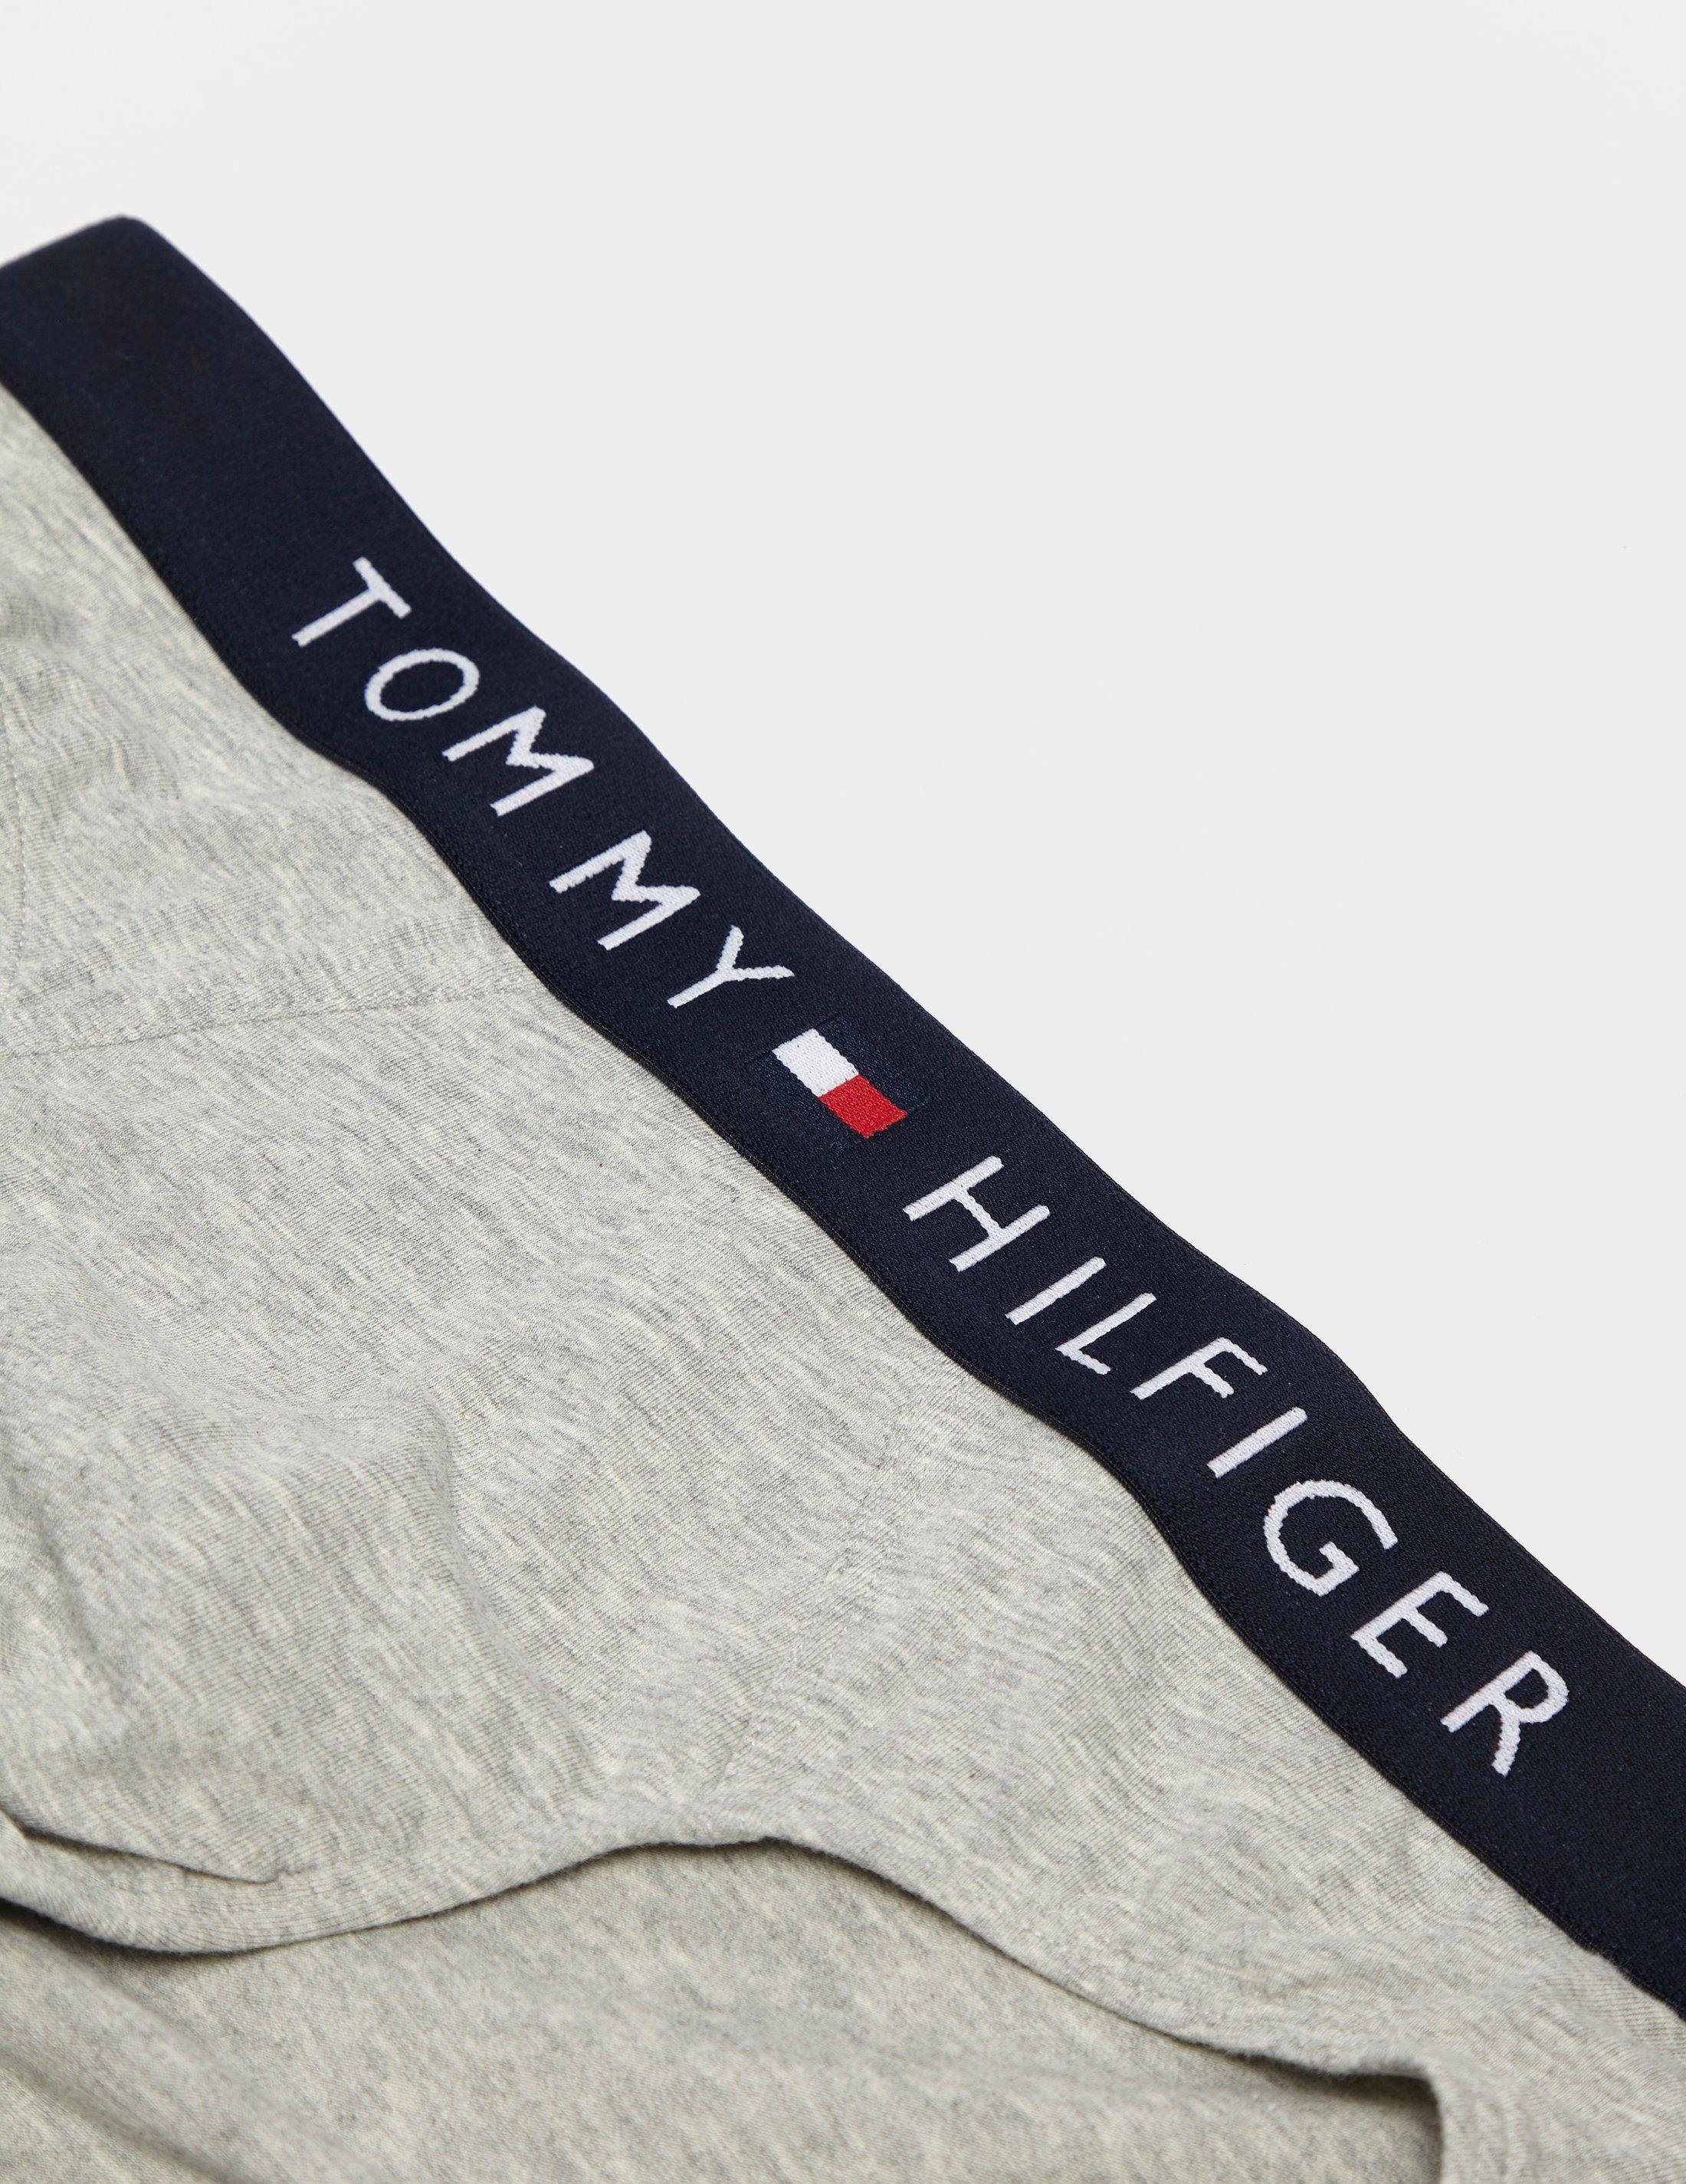 Tommy Hilfiger Flag Briefs